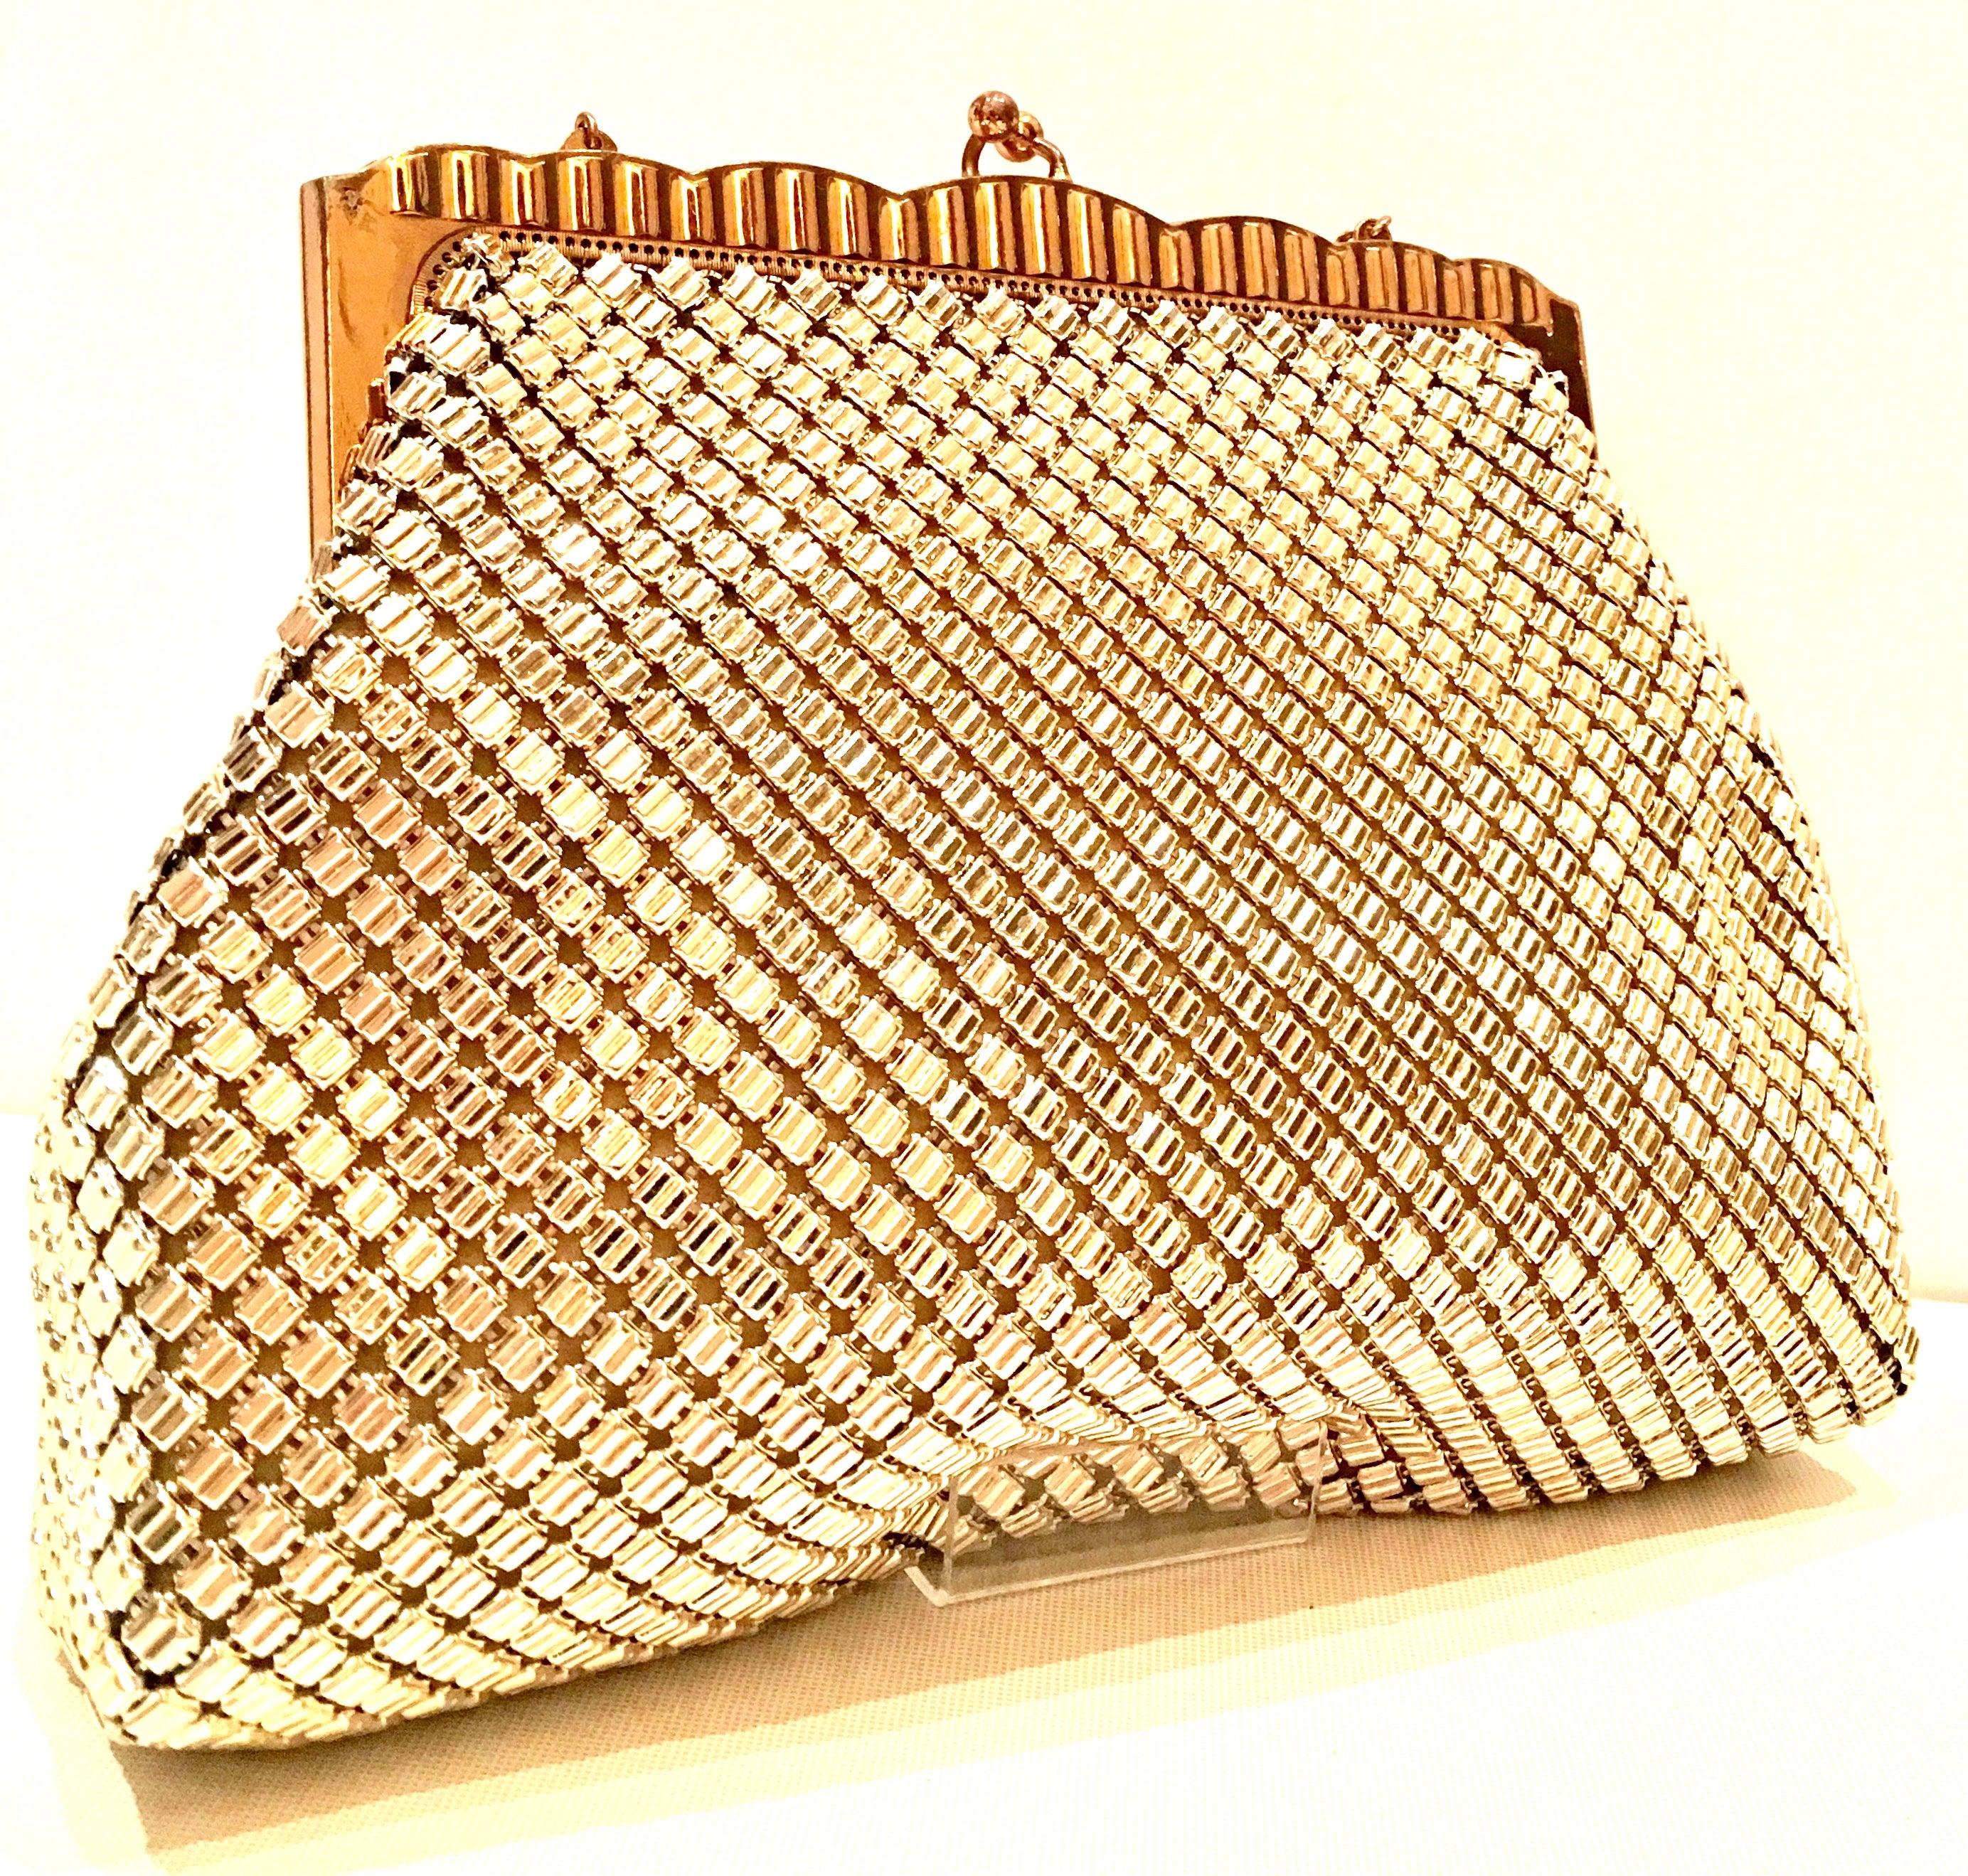 1bb924b0d3 Vintage Whiting and Davis Gold Metal Mesh Handbag For Sale at 1stdibs